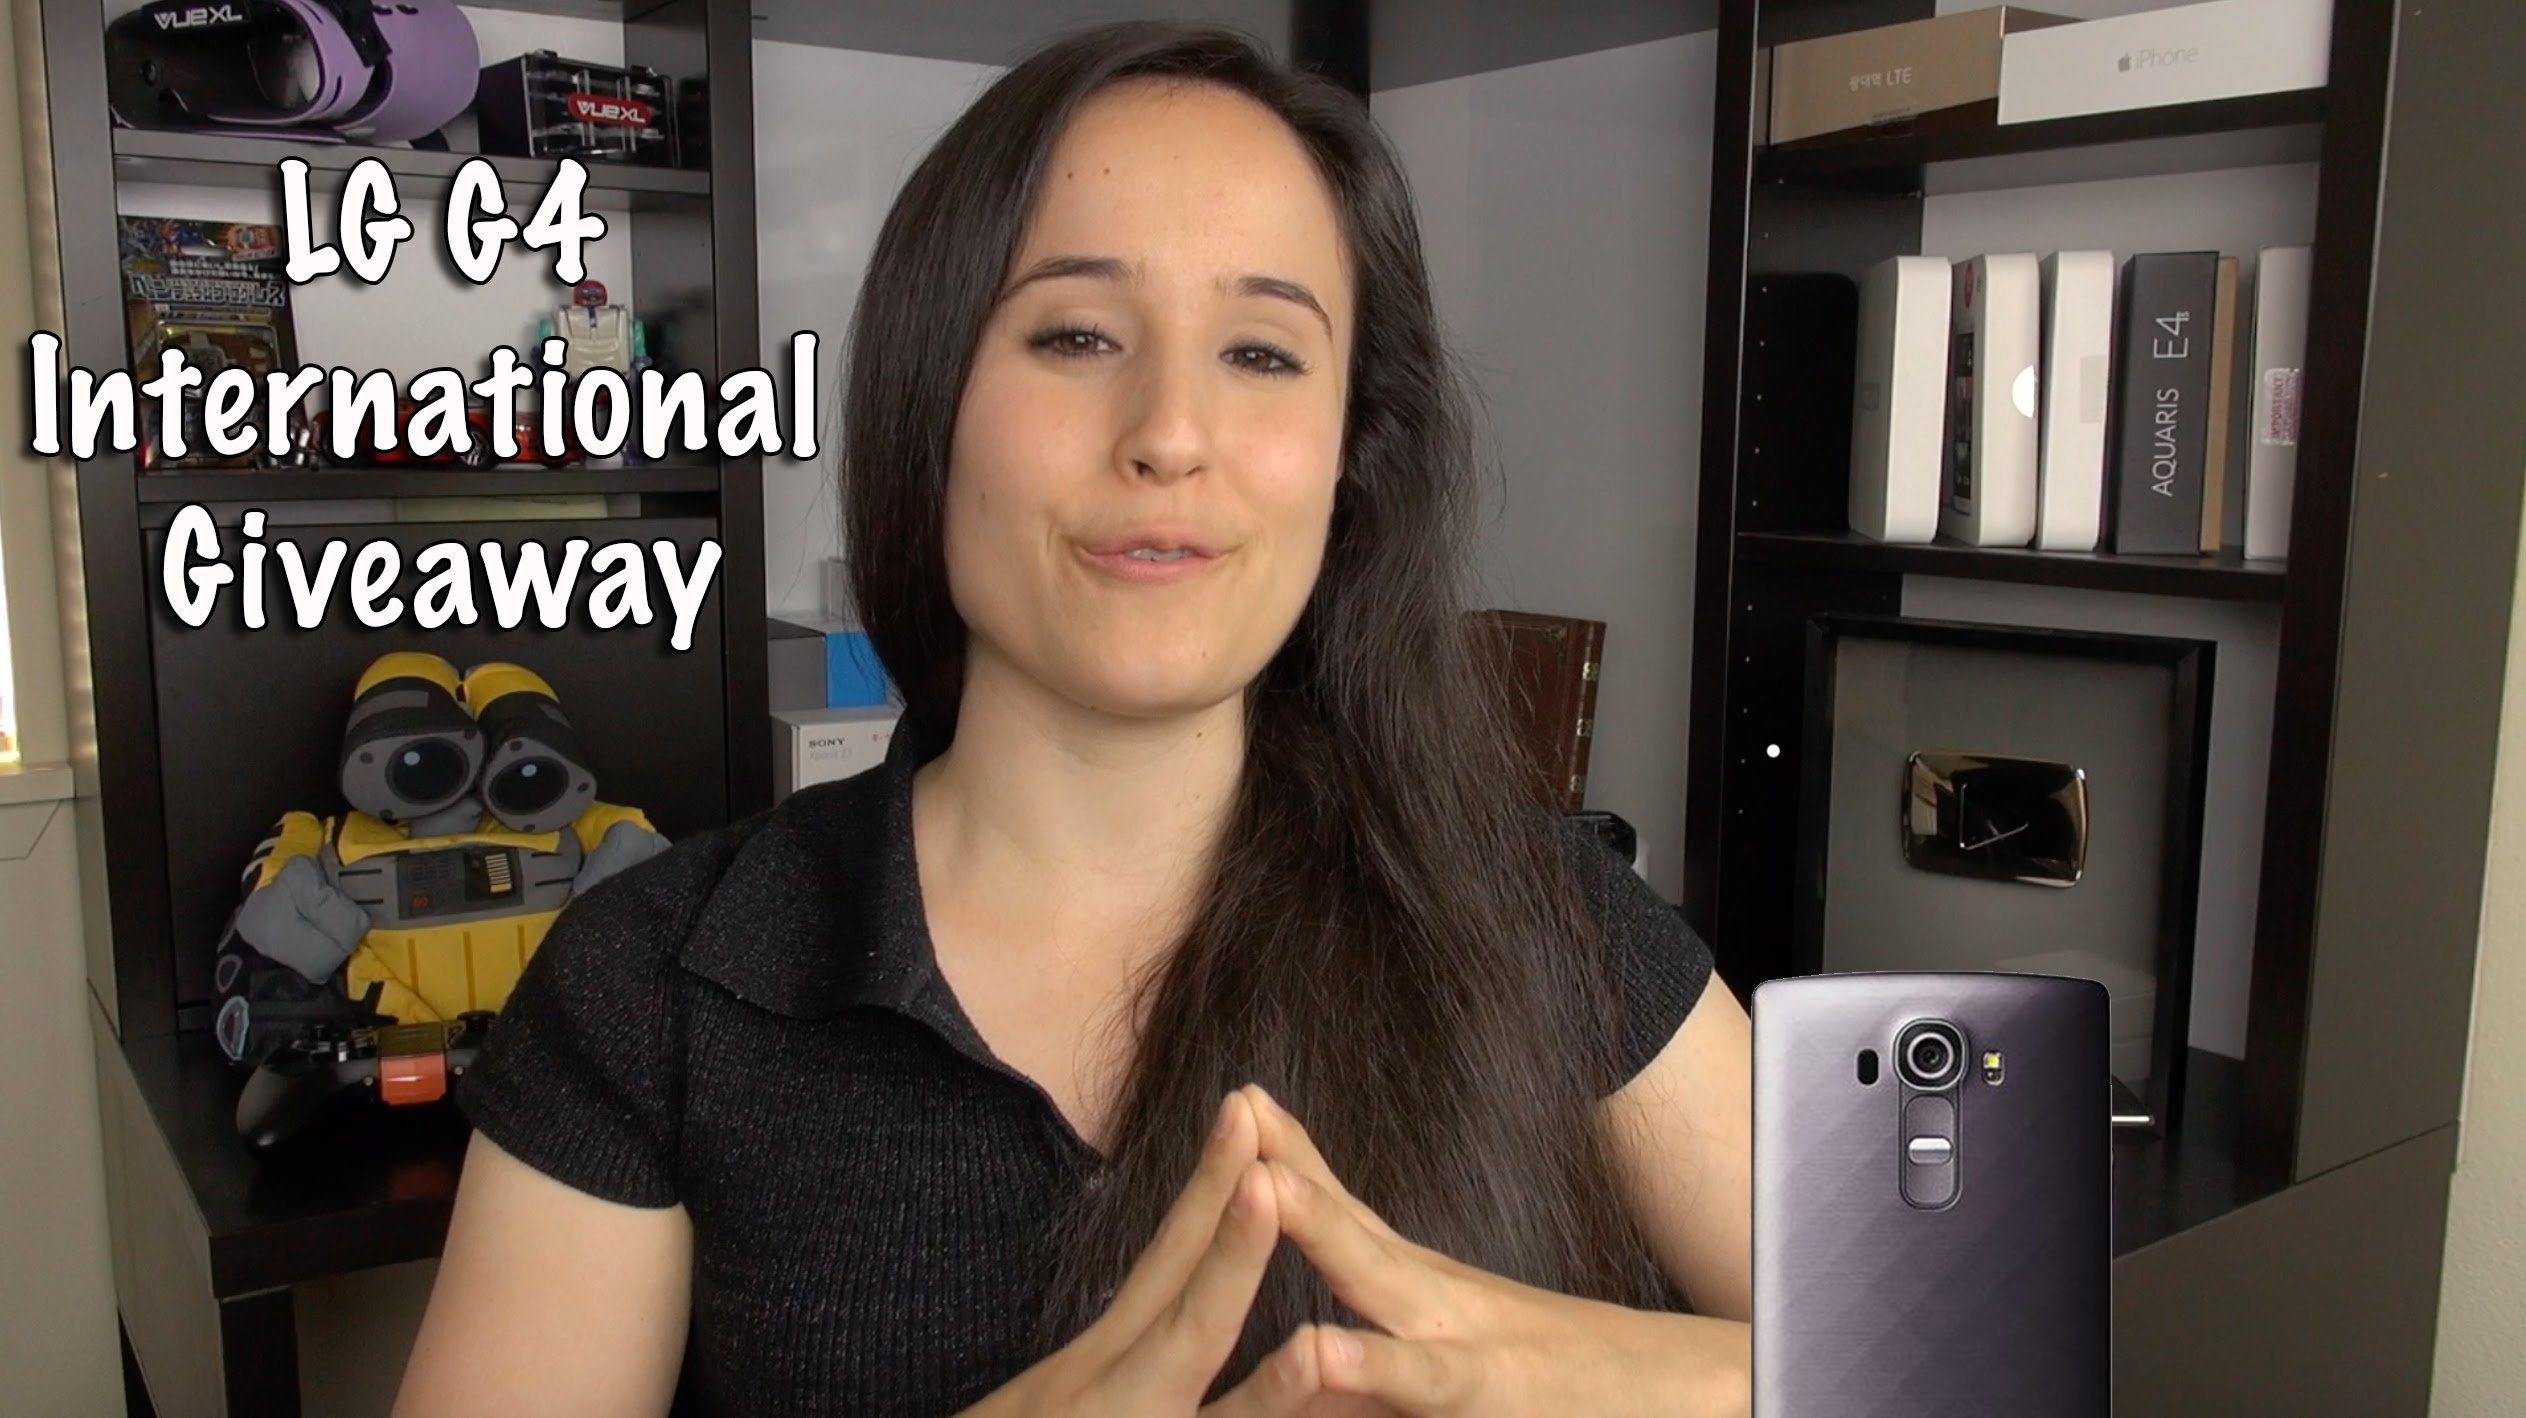 LG G4: International Giveaway!